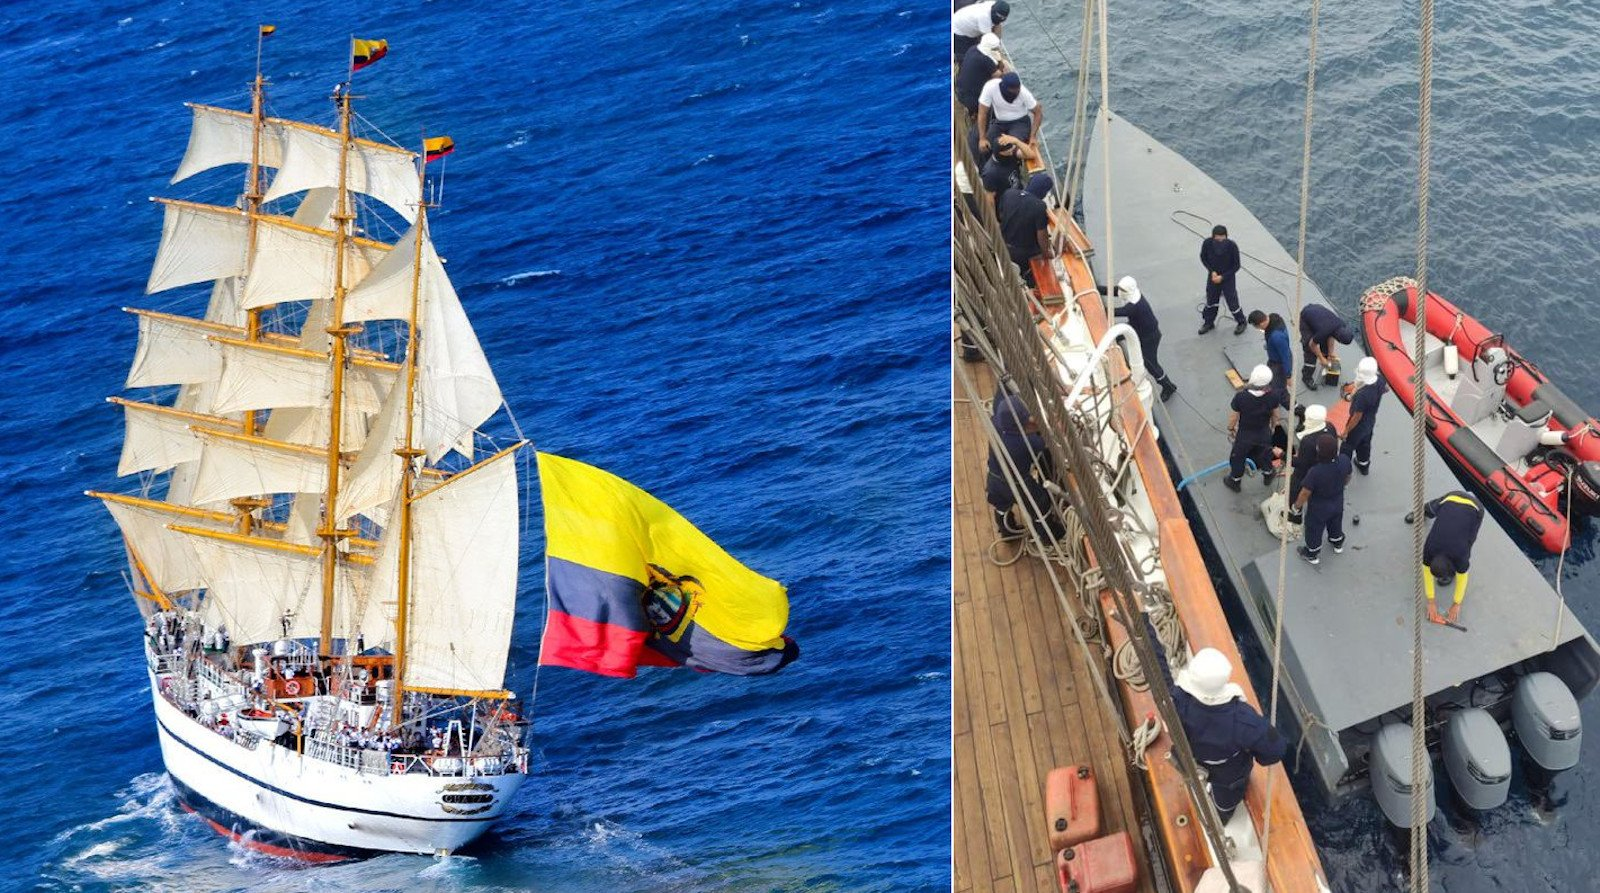 Ecuadorian Navy Sailing Ship Interdicts Drug Smugglers in the Pacific - USNI News